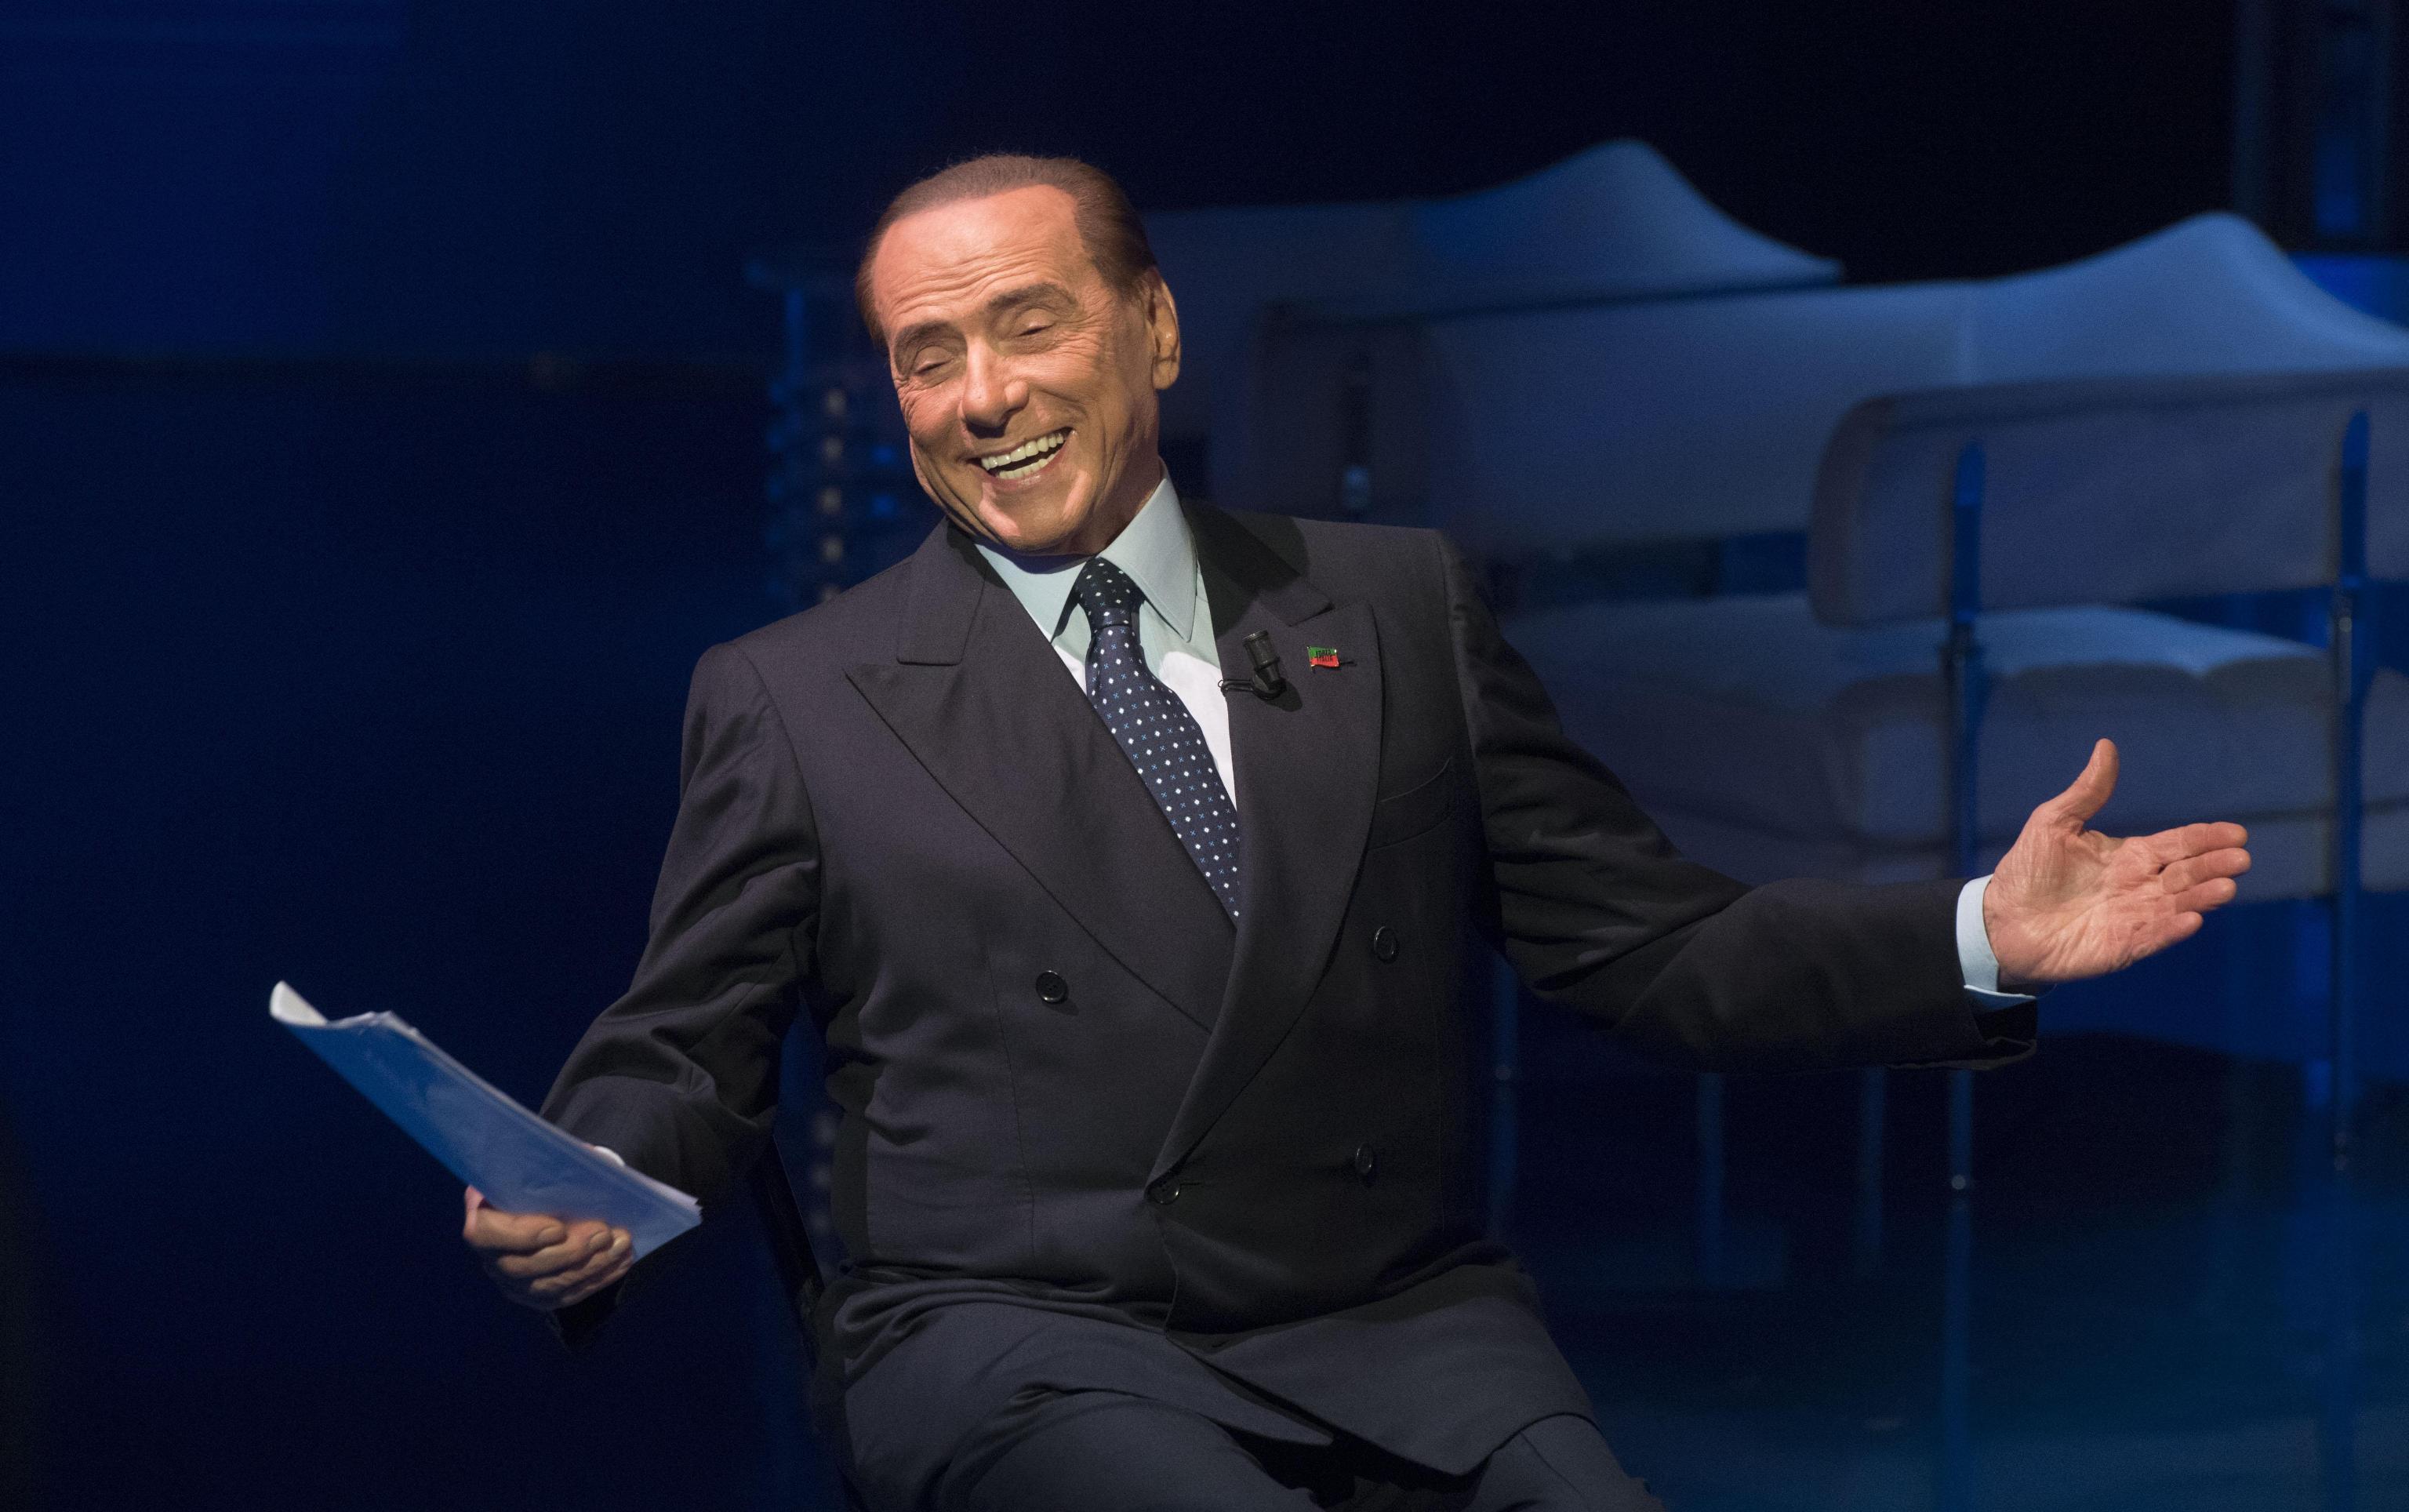 Al via udienza Berlusconi a Strasburgo, aula strapiena